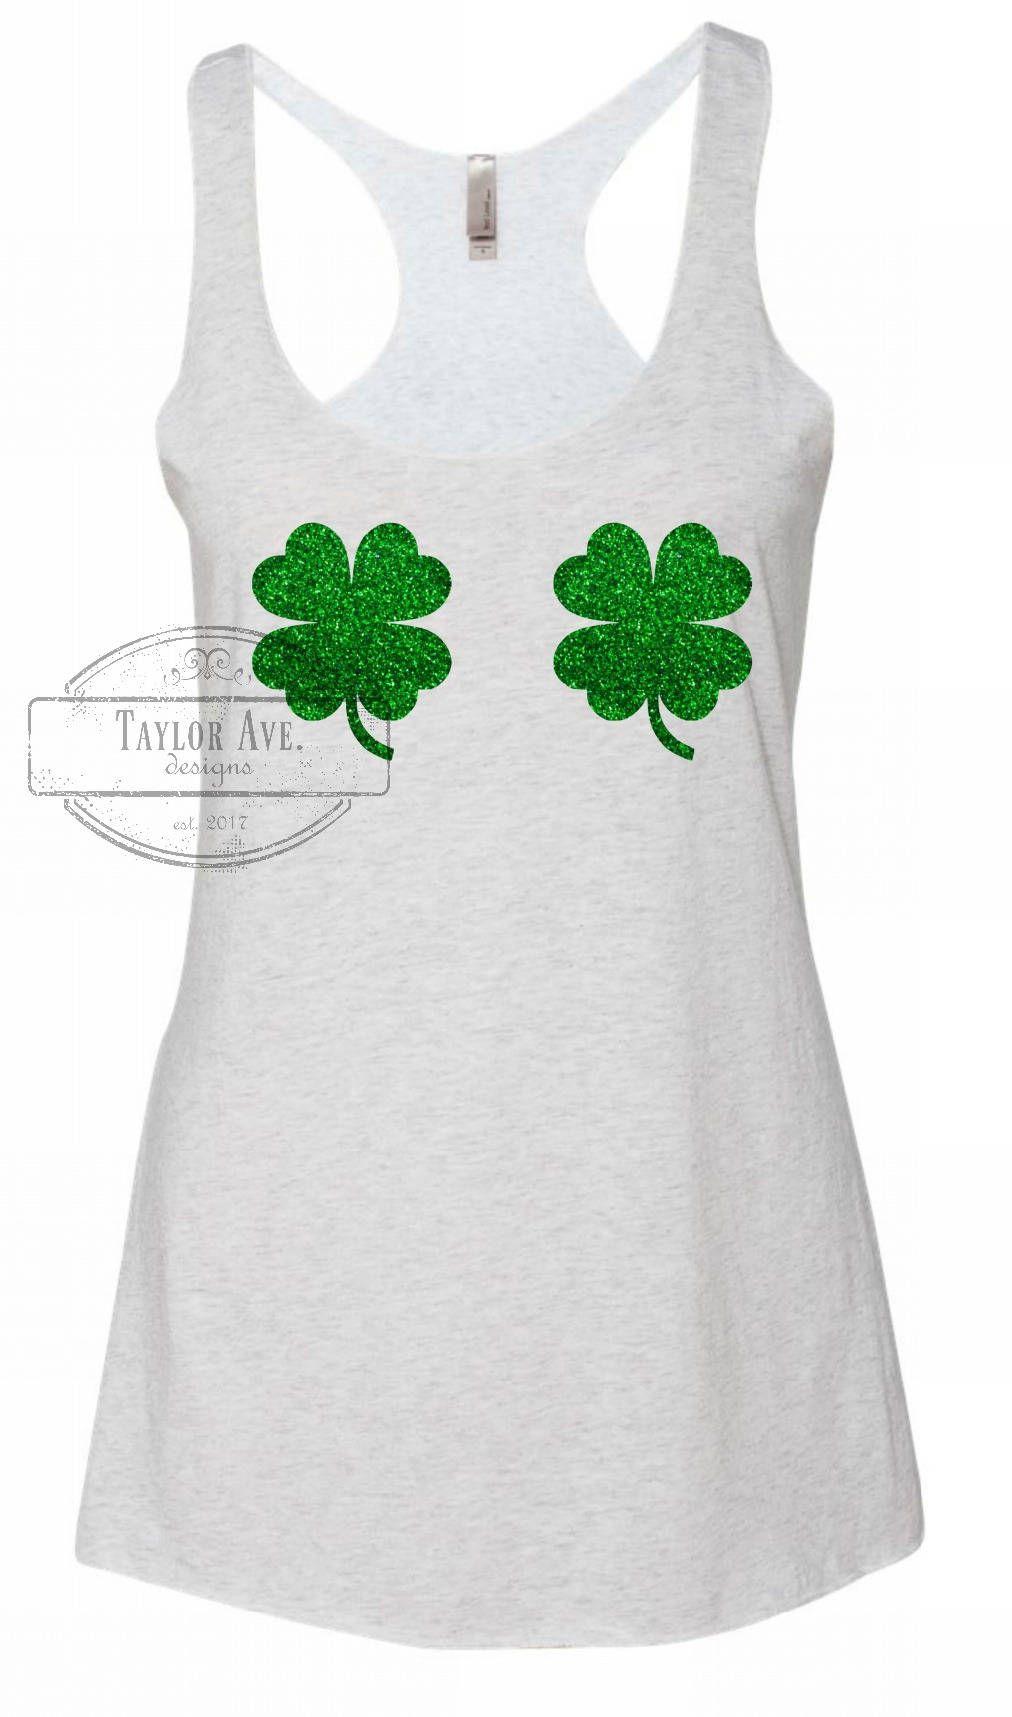 01c89bea3 Glitter Shamrocks Tank. Funny St. Patrick's Tank Top. Workout Shirt. St.  Patty's Day. Womens Shirts. T-shirts. Shamrocks. Clovers. by  TaylorAveDesigns on ...